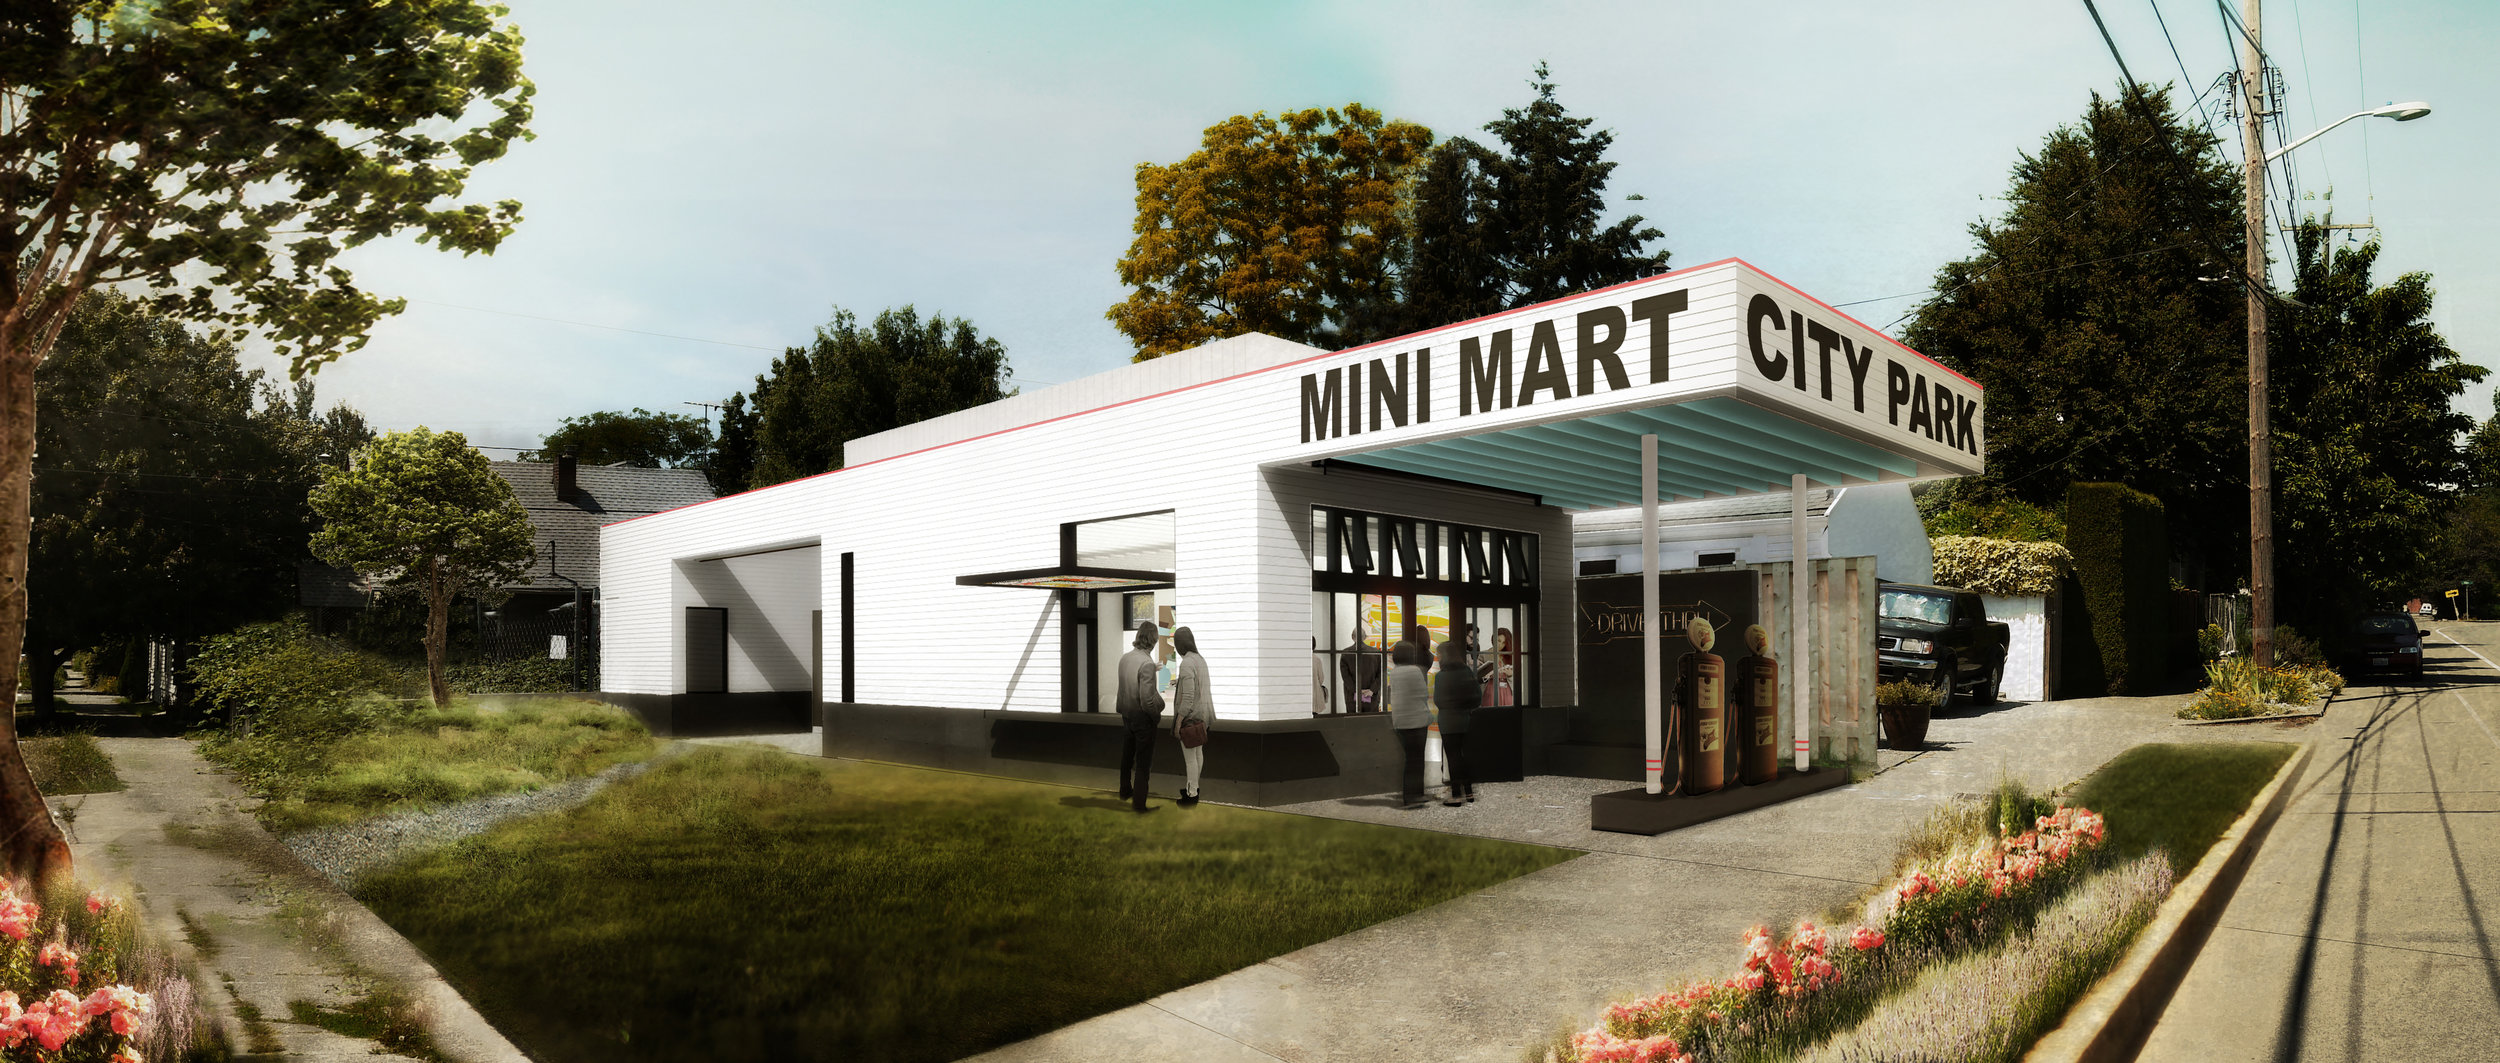 goCstudio_Mini Mart City Park_Rendering 1.jpg